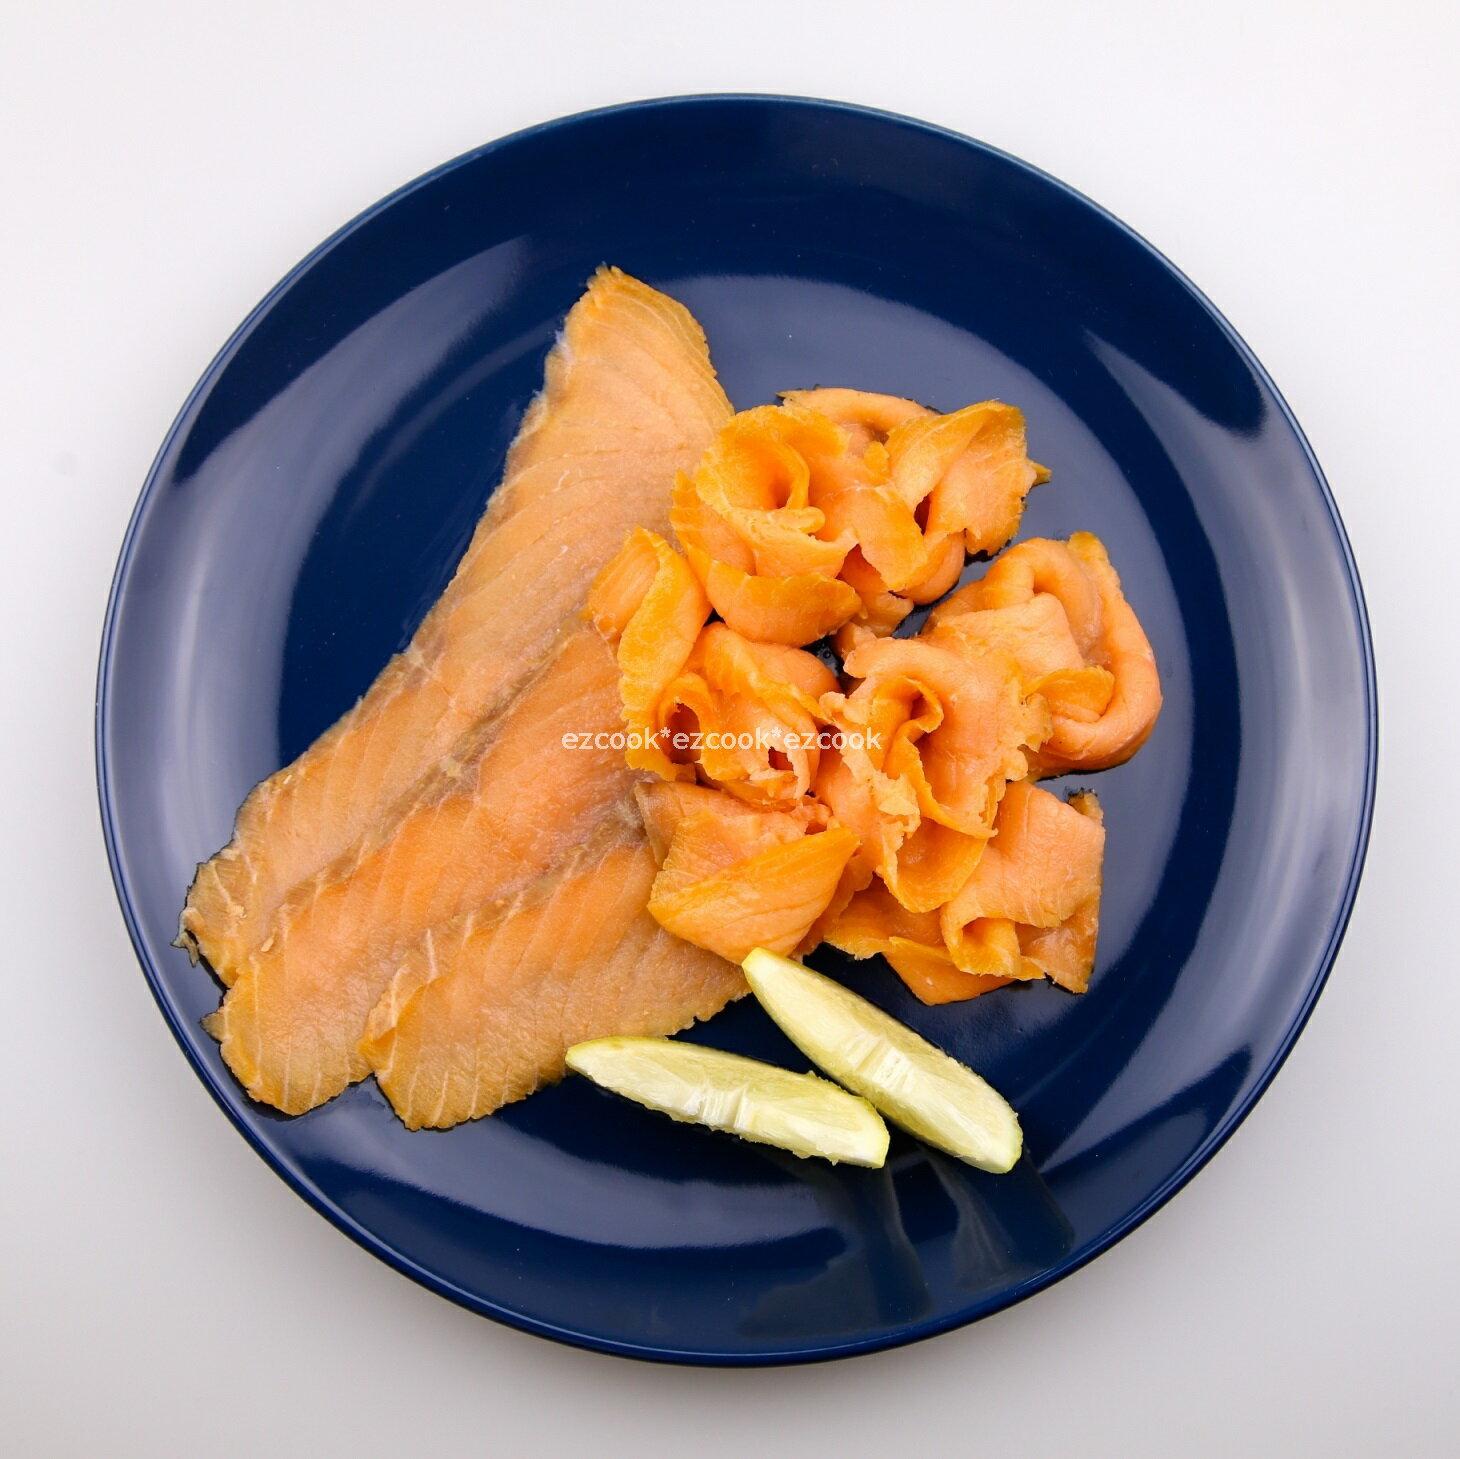 [ezcook]挪威煙燻鮭魚(600g/包)(產地:挪威,加工:台灣)